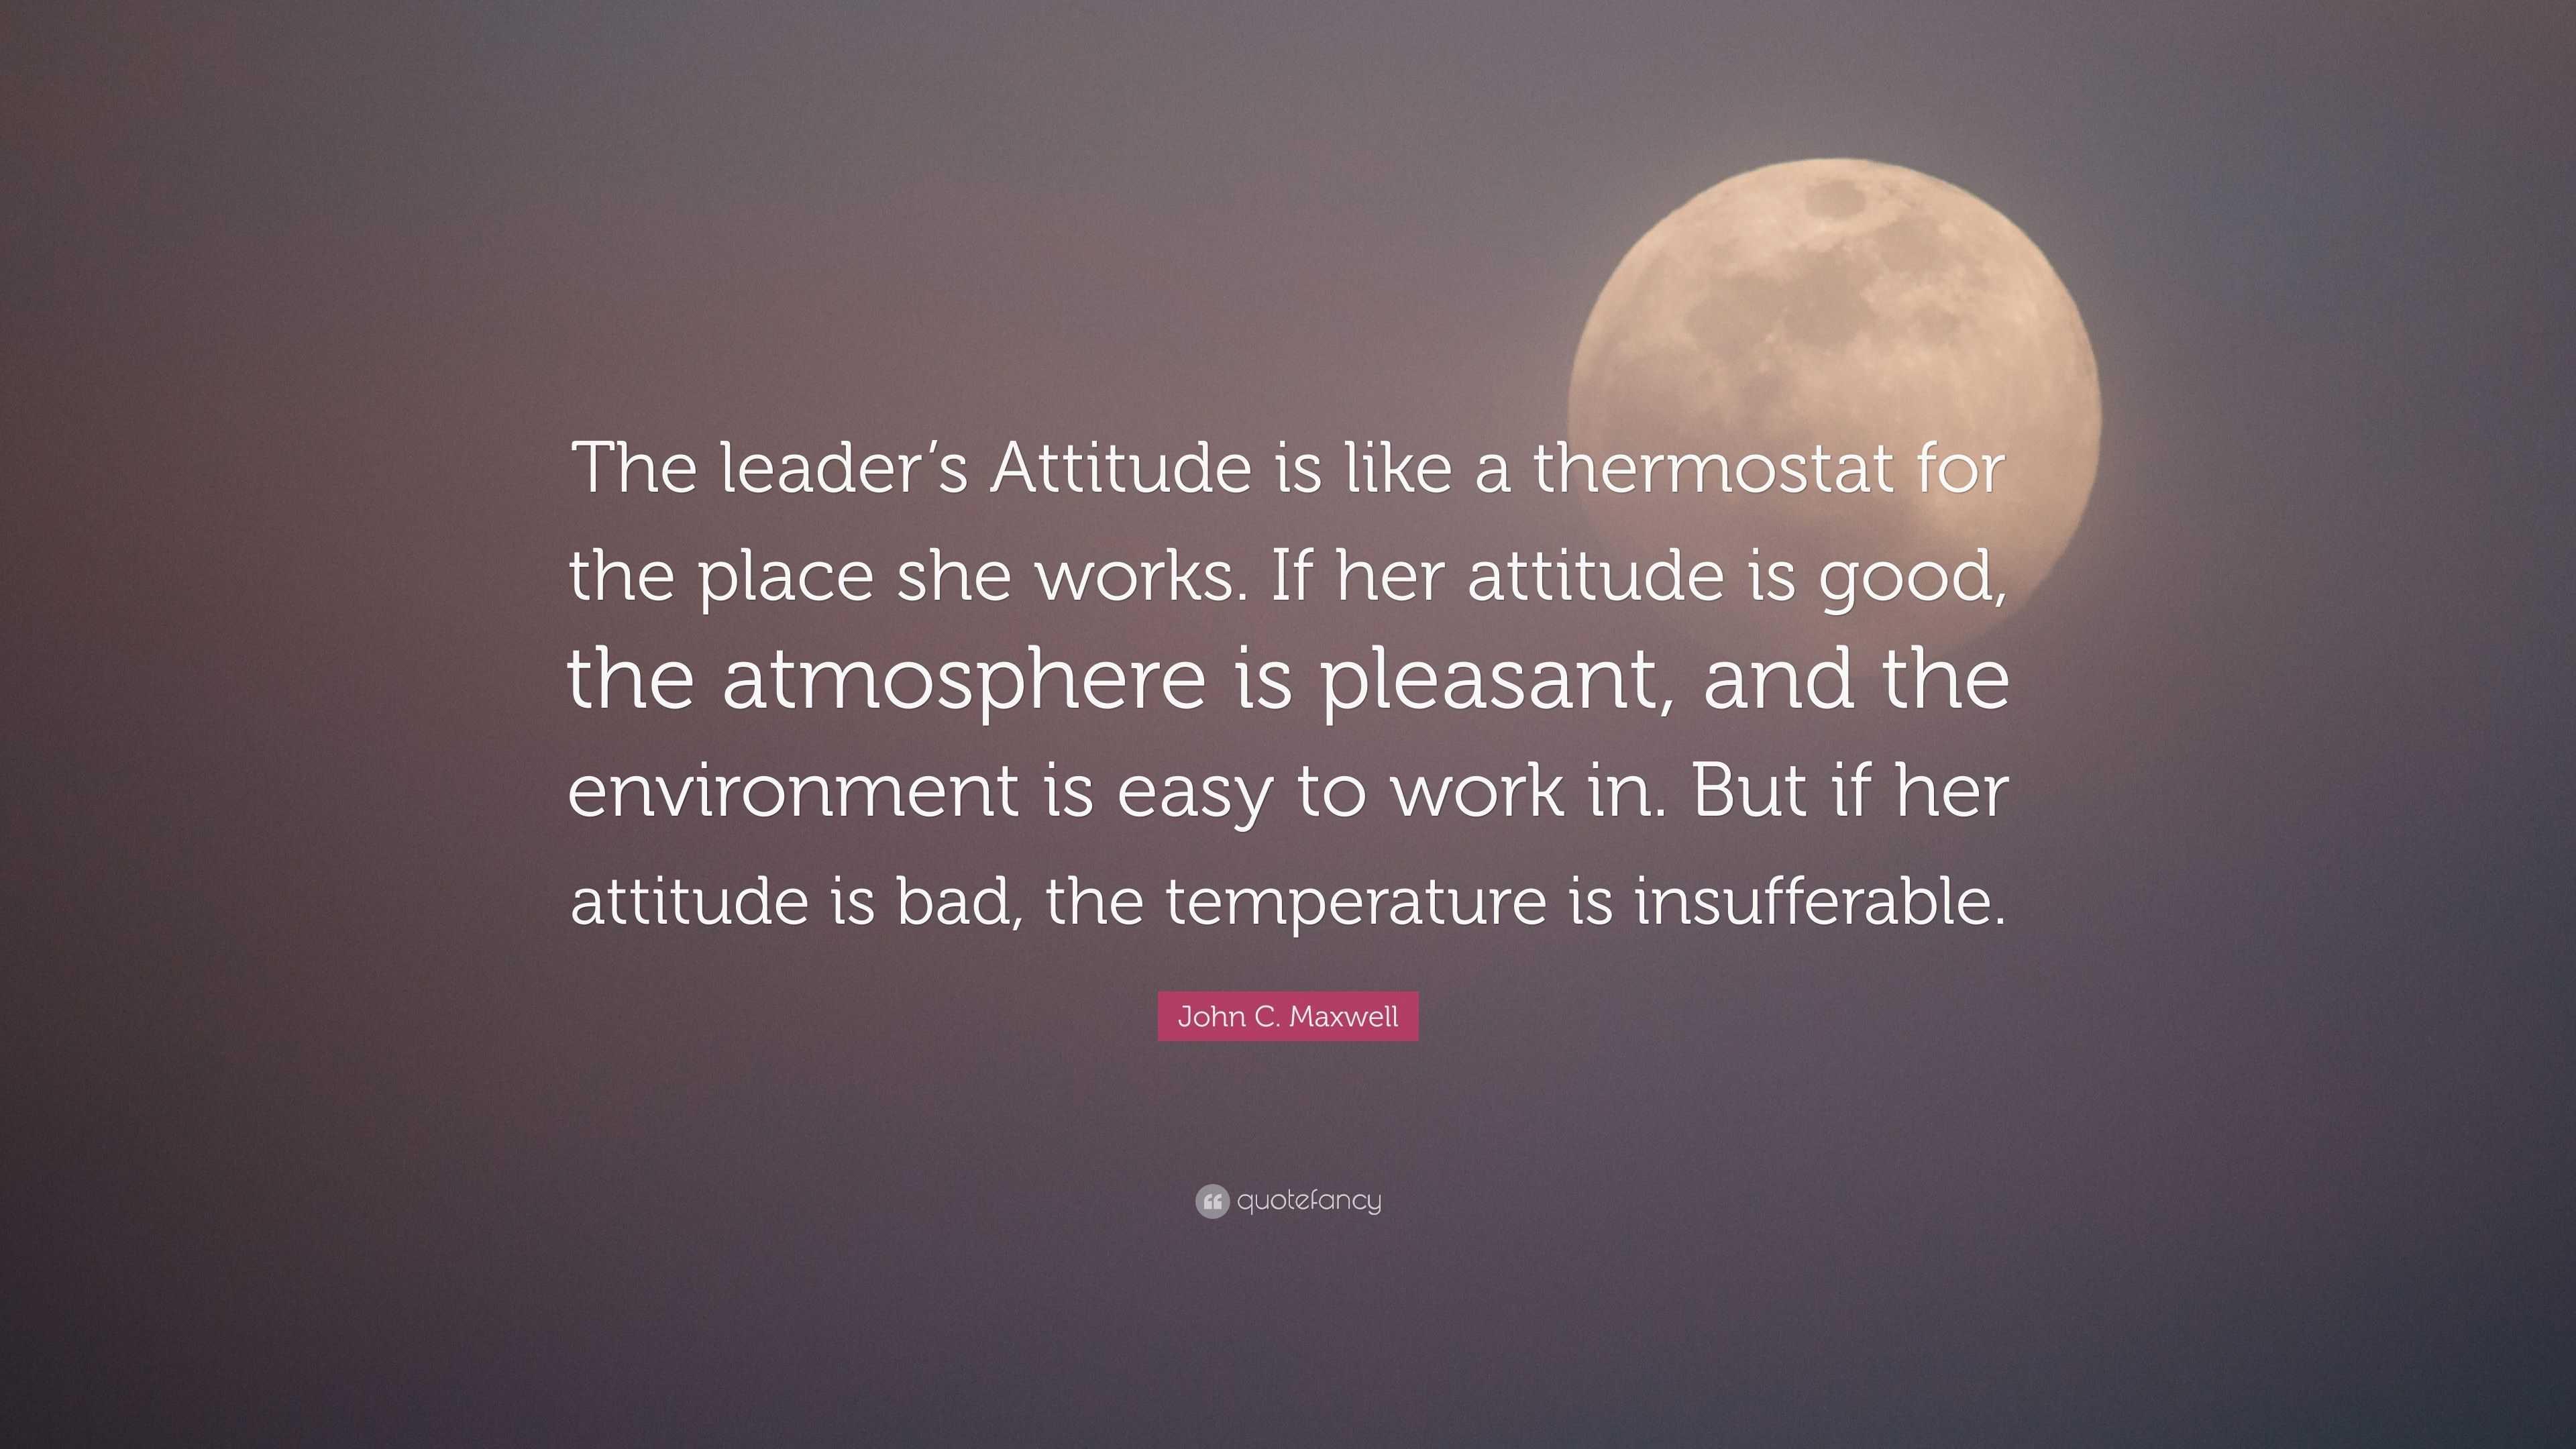 john c  maxwell quote   u201cthe leader u2019s attitude is like a